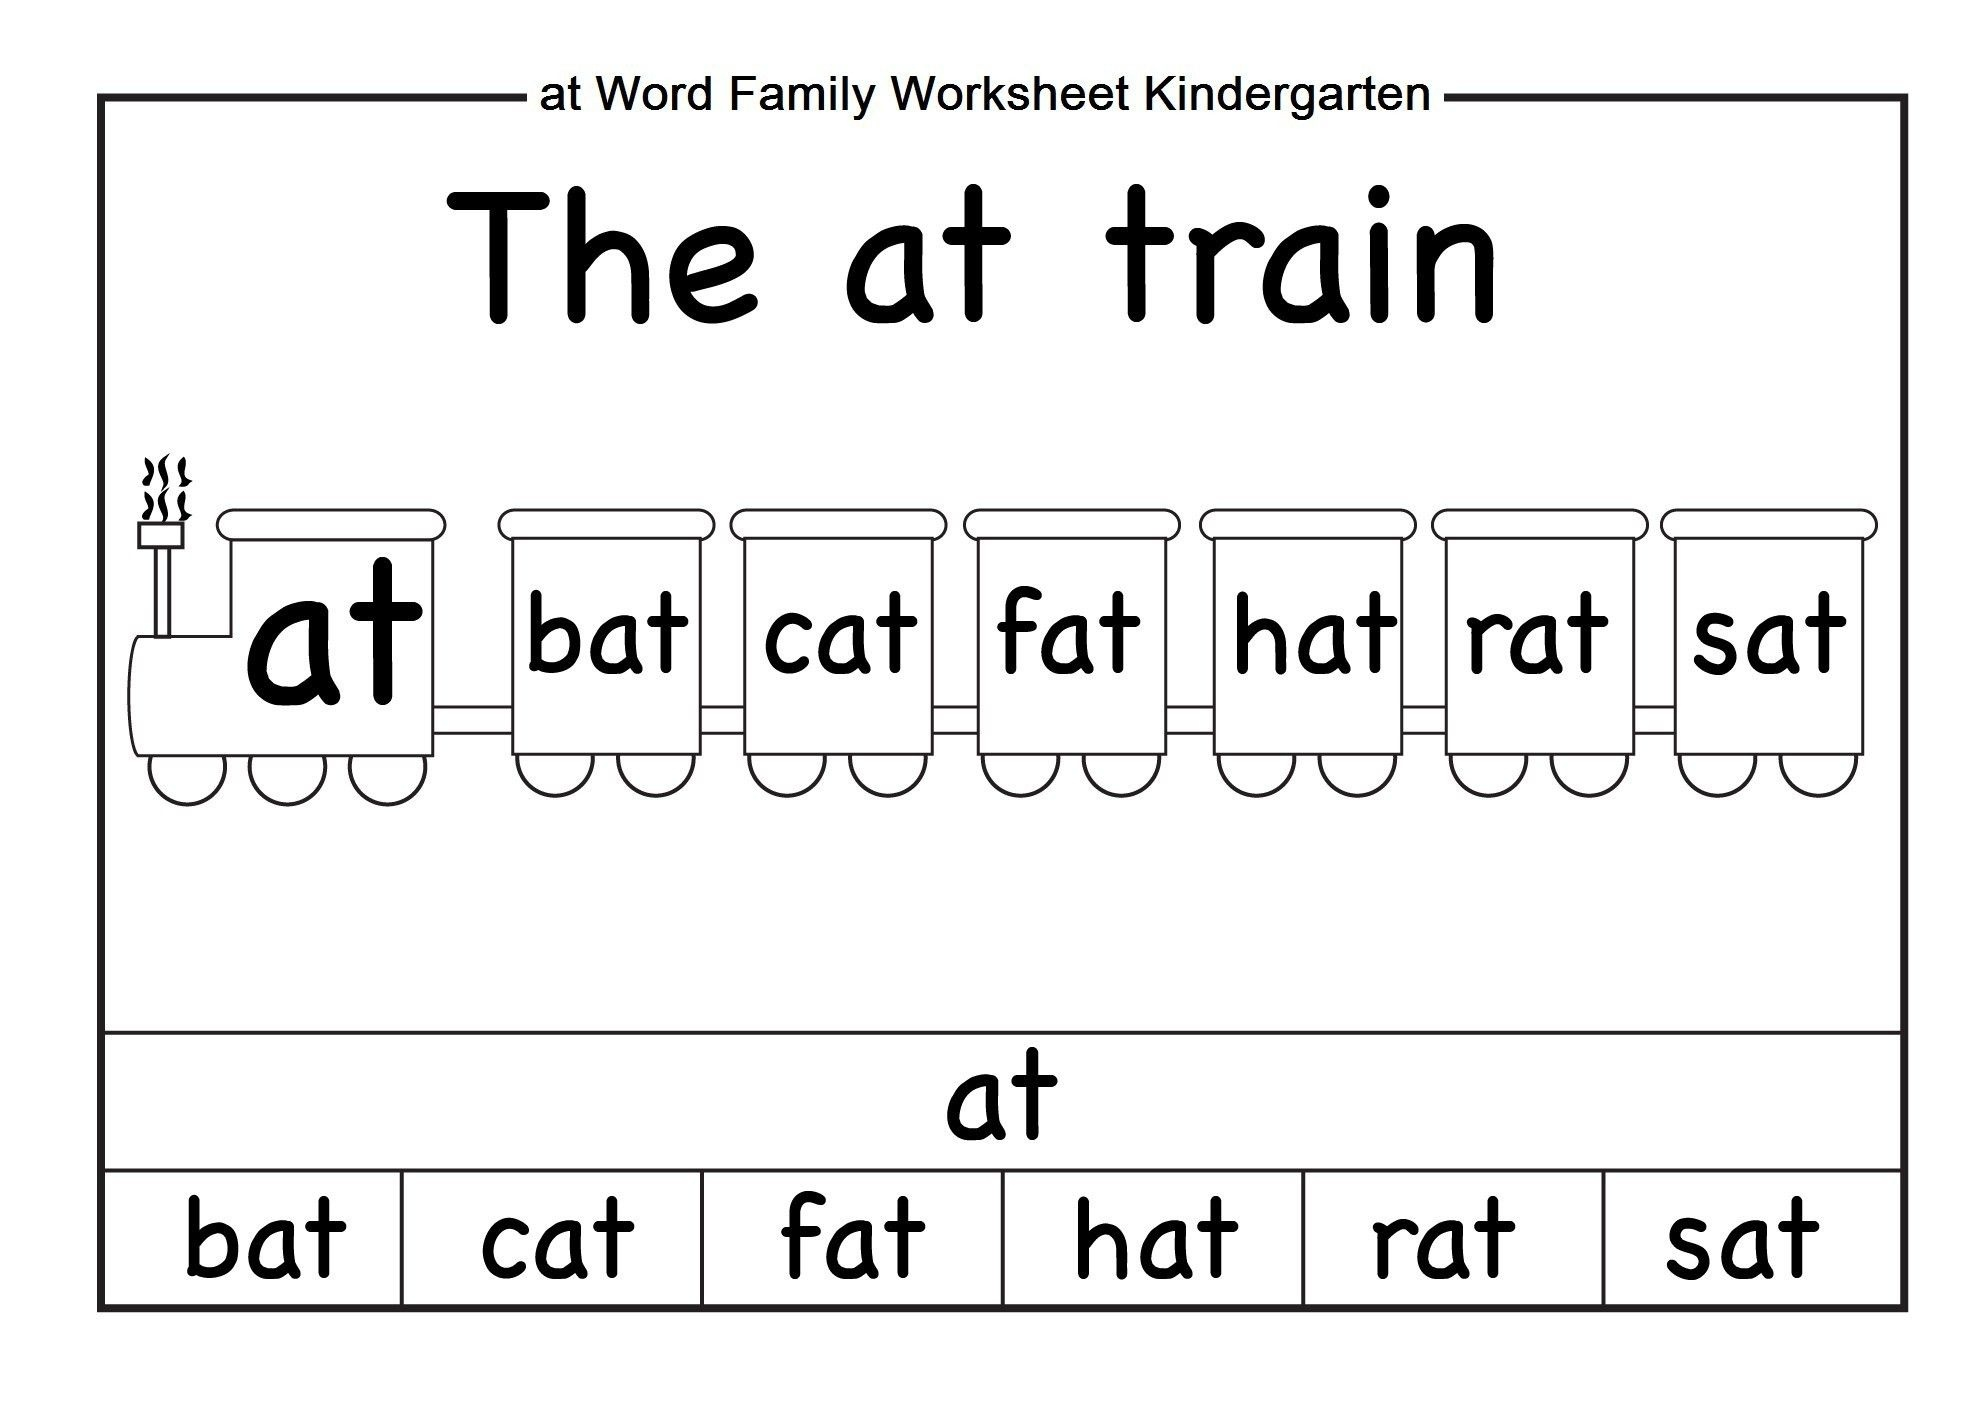 Word Family Worksheets Kindergarten | Briefencounters - Free Printable Word Family Worksheets For Kindergarten